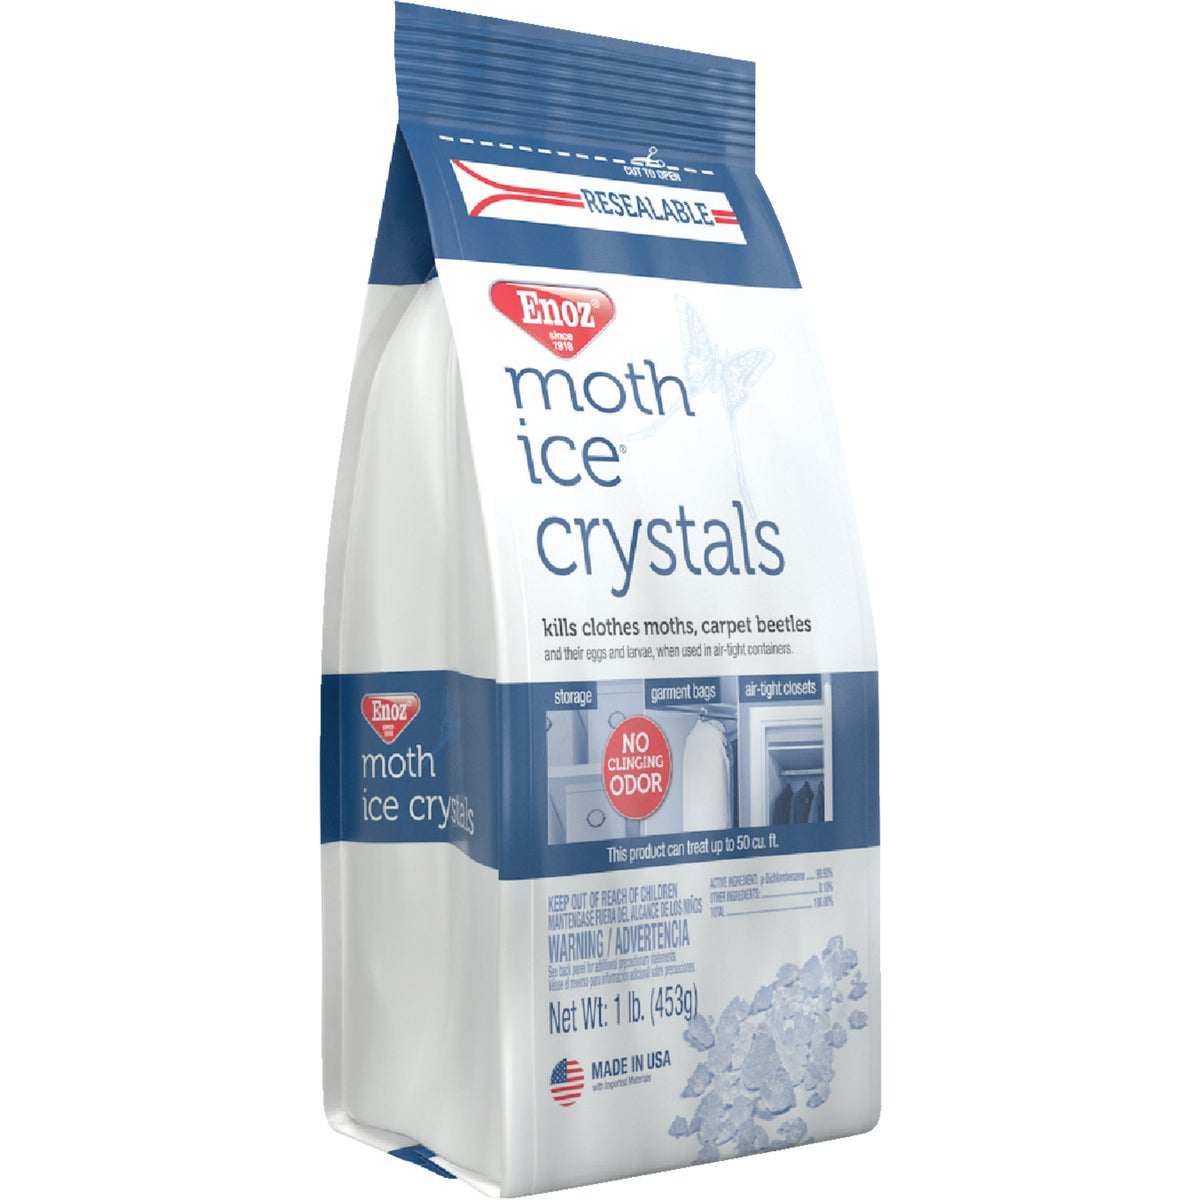 1LB MOTH ICE CRYSTALS